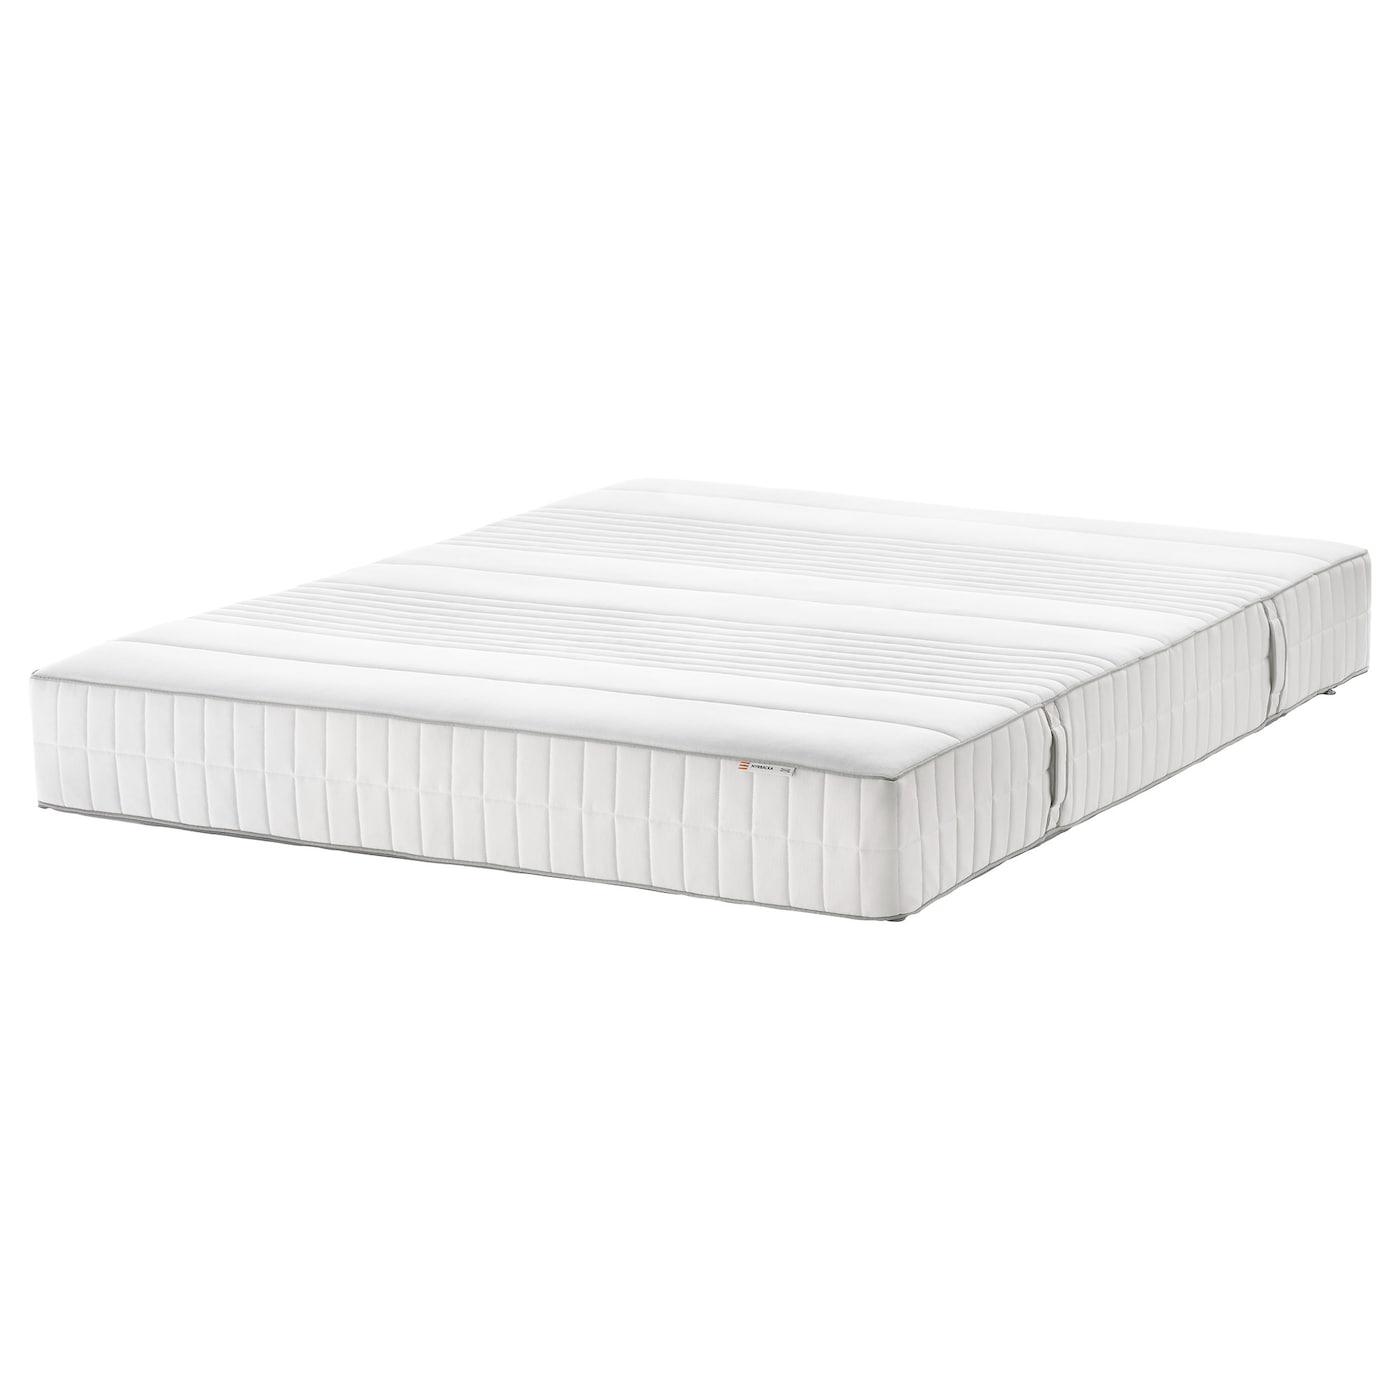 Myrbacka Colchon Espuma Viscoelastica Firme Blanco 160 X 200 Cm Ikea